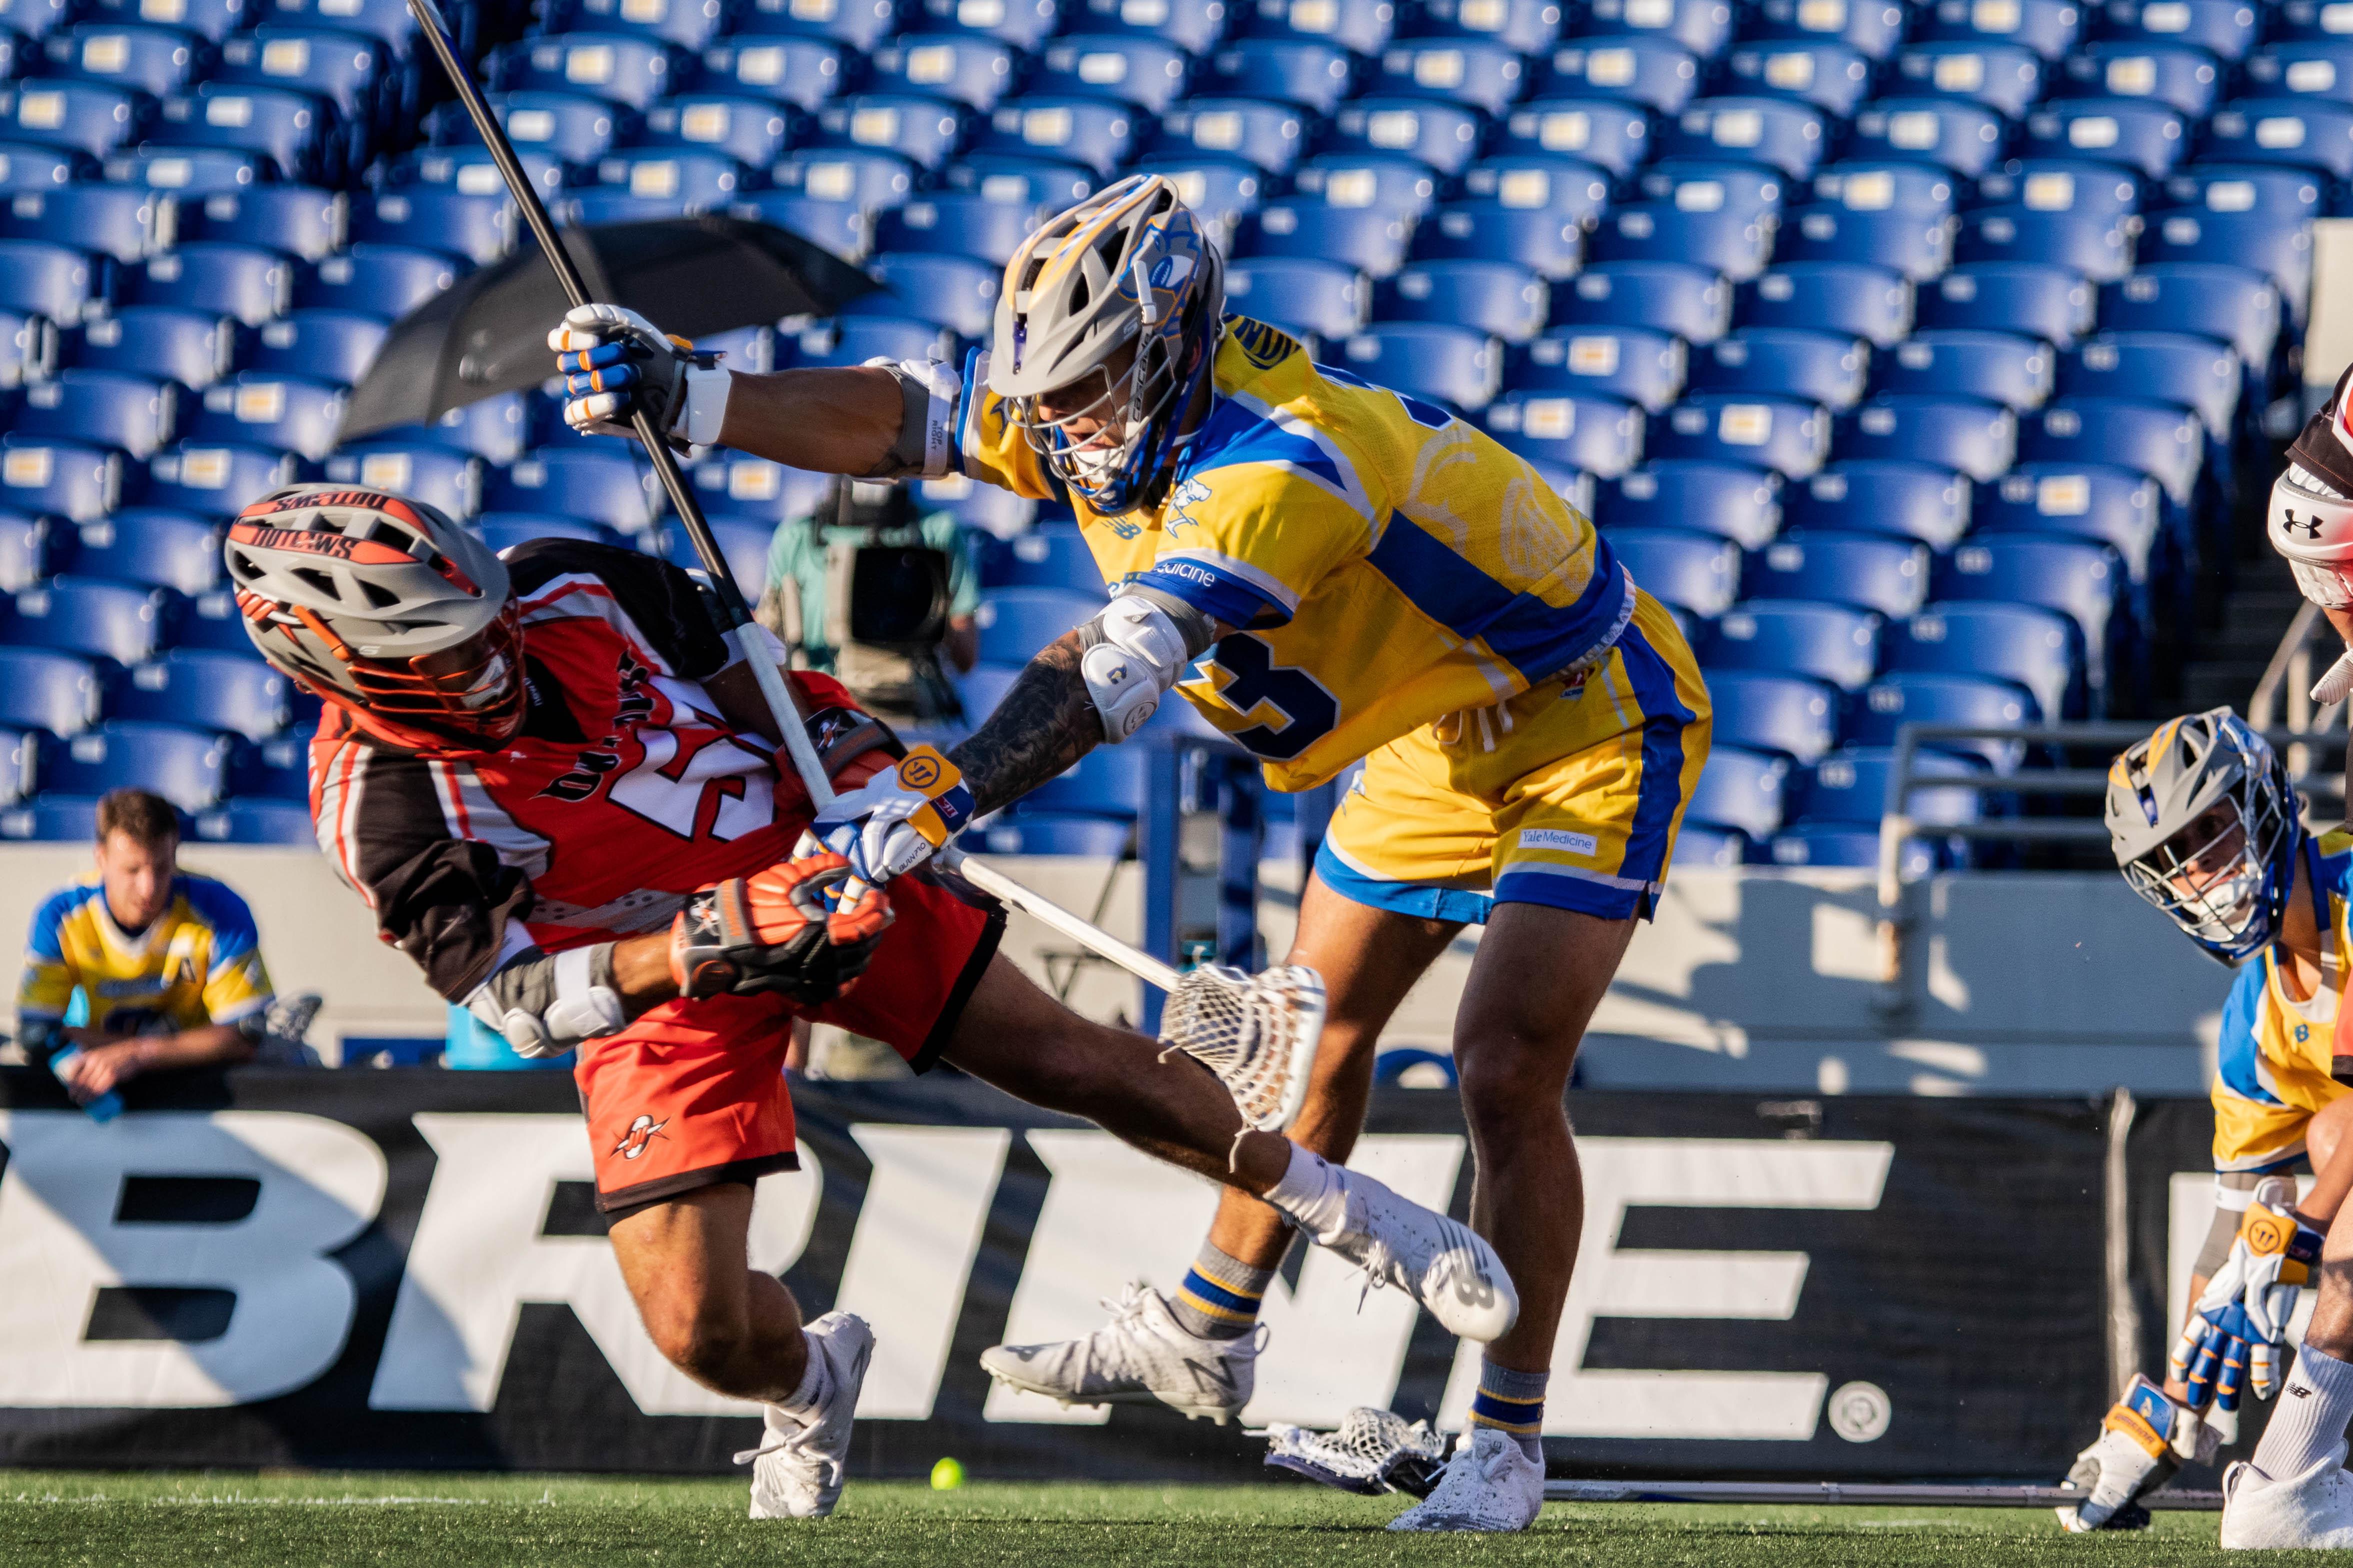 Major League Lacrosse 2020. Denver Outlaws Connecticut Hammerheads Photo: MLL / Pretty Instant